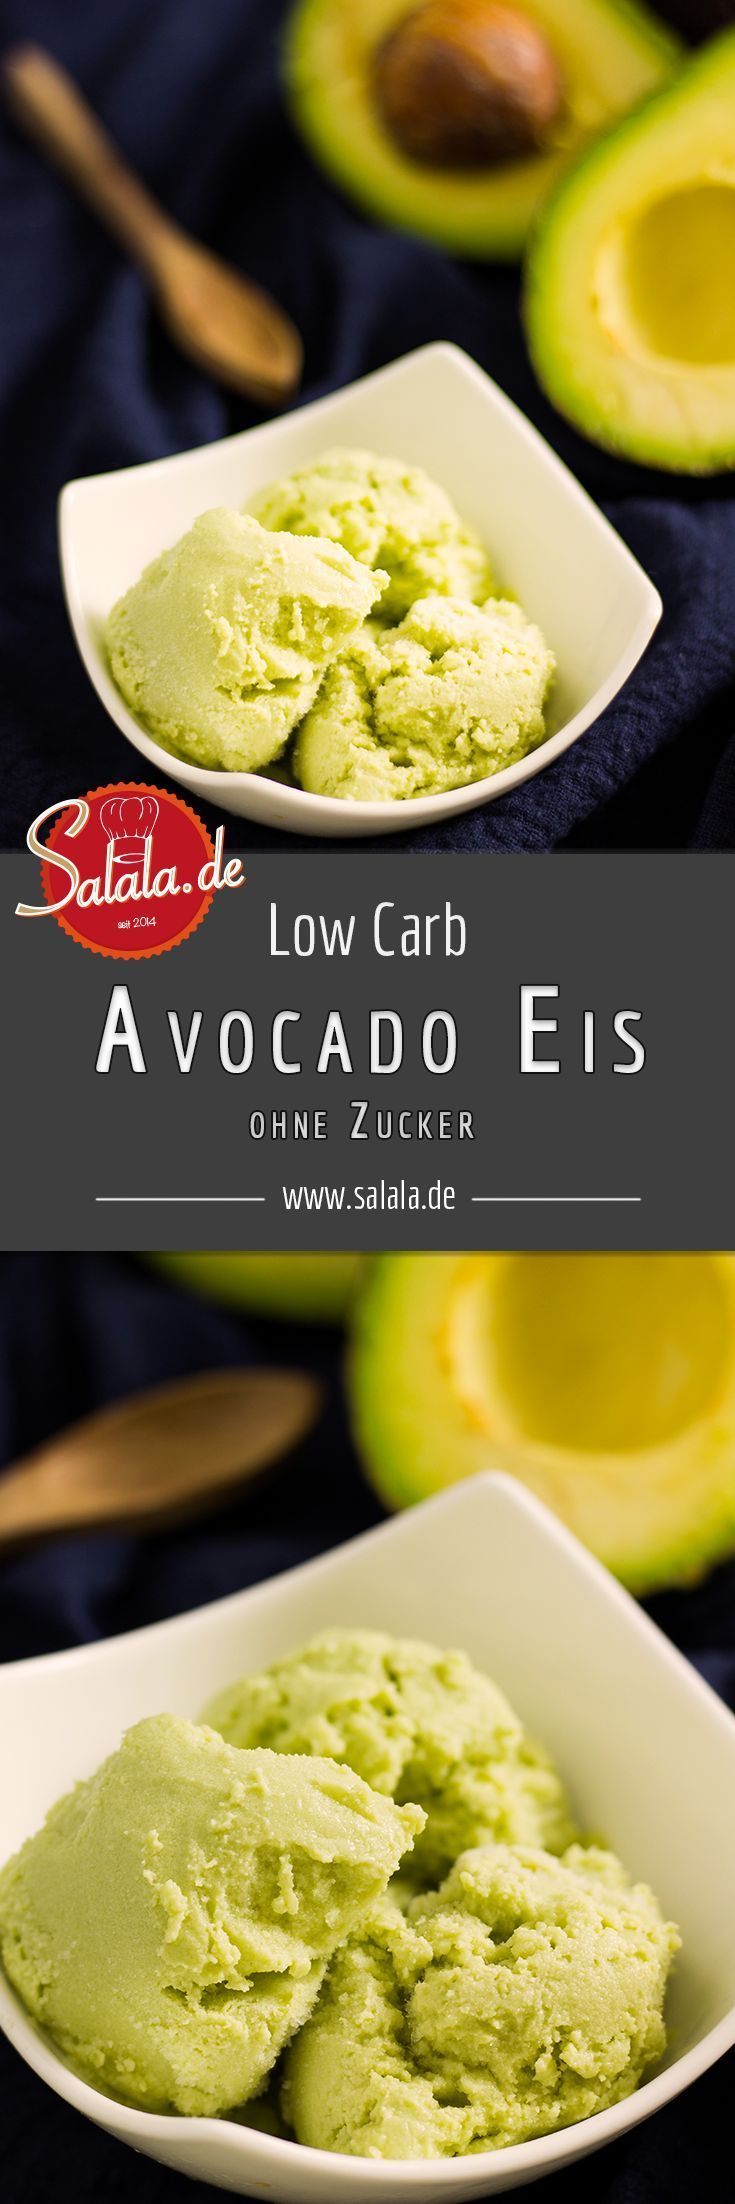 Zuckerfreies kohlenhydratarmes Avocado-Eis   - Low Carb Dessert // Low Carb Nachtisch -